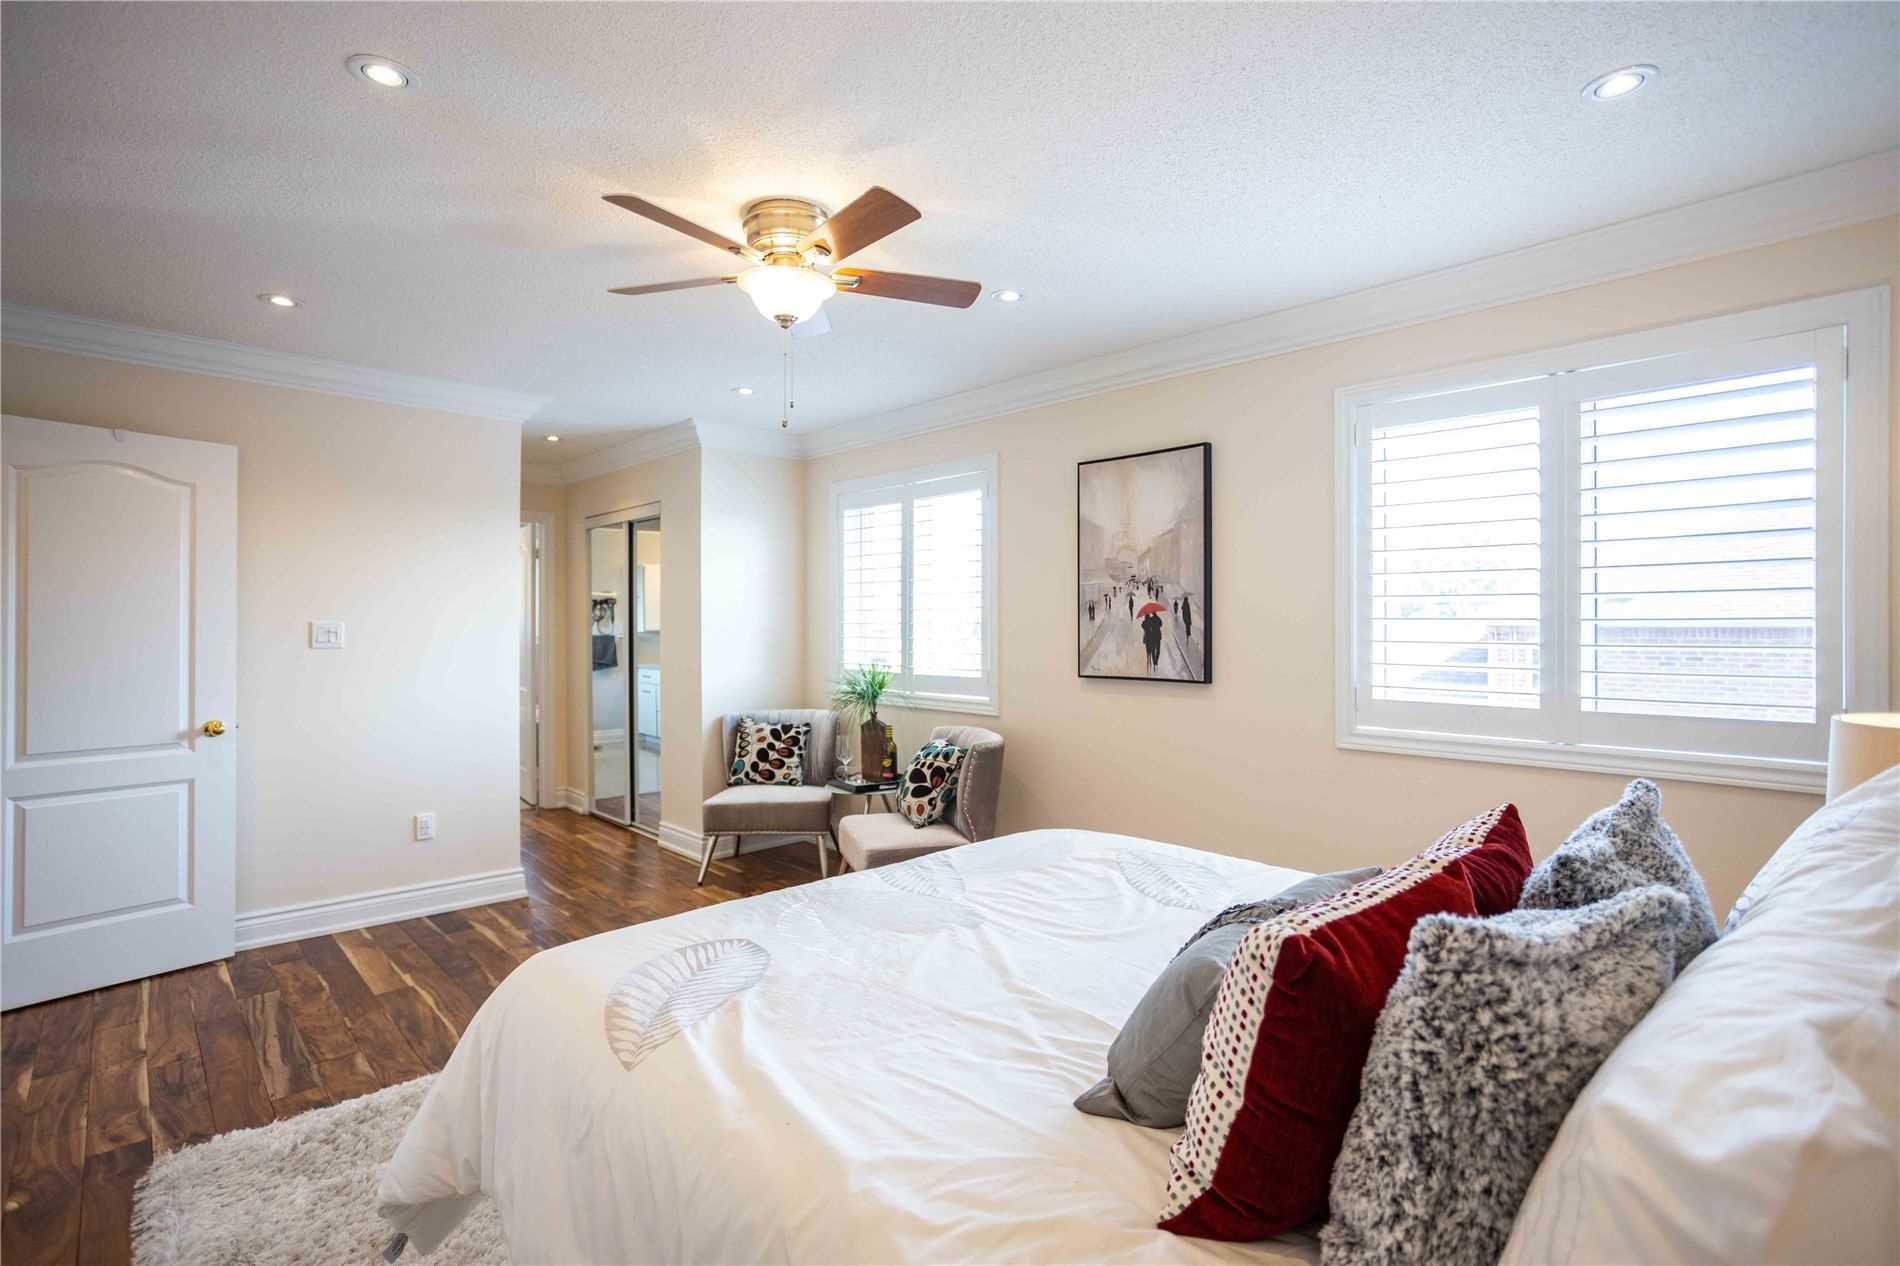 98 Lemsford Dr, Markham, Ontario L3S4H5, 4 Bedrooms Bedrooms, 8 Rooms Rooms,3 BathroomsBathrooms,Detached,For Sale,Lemsford,N5354758